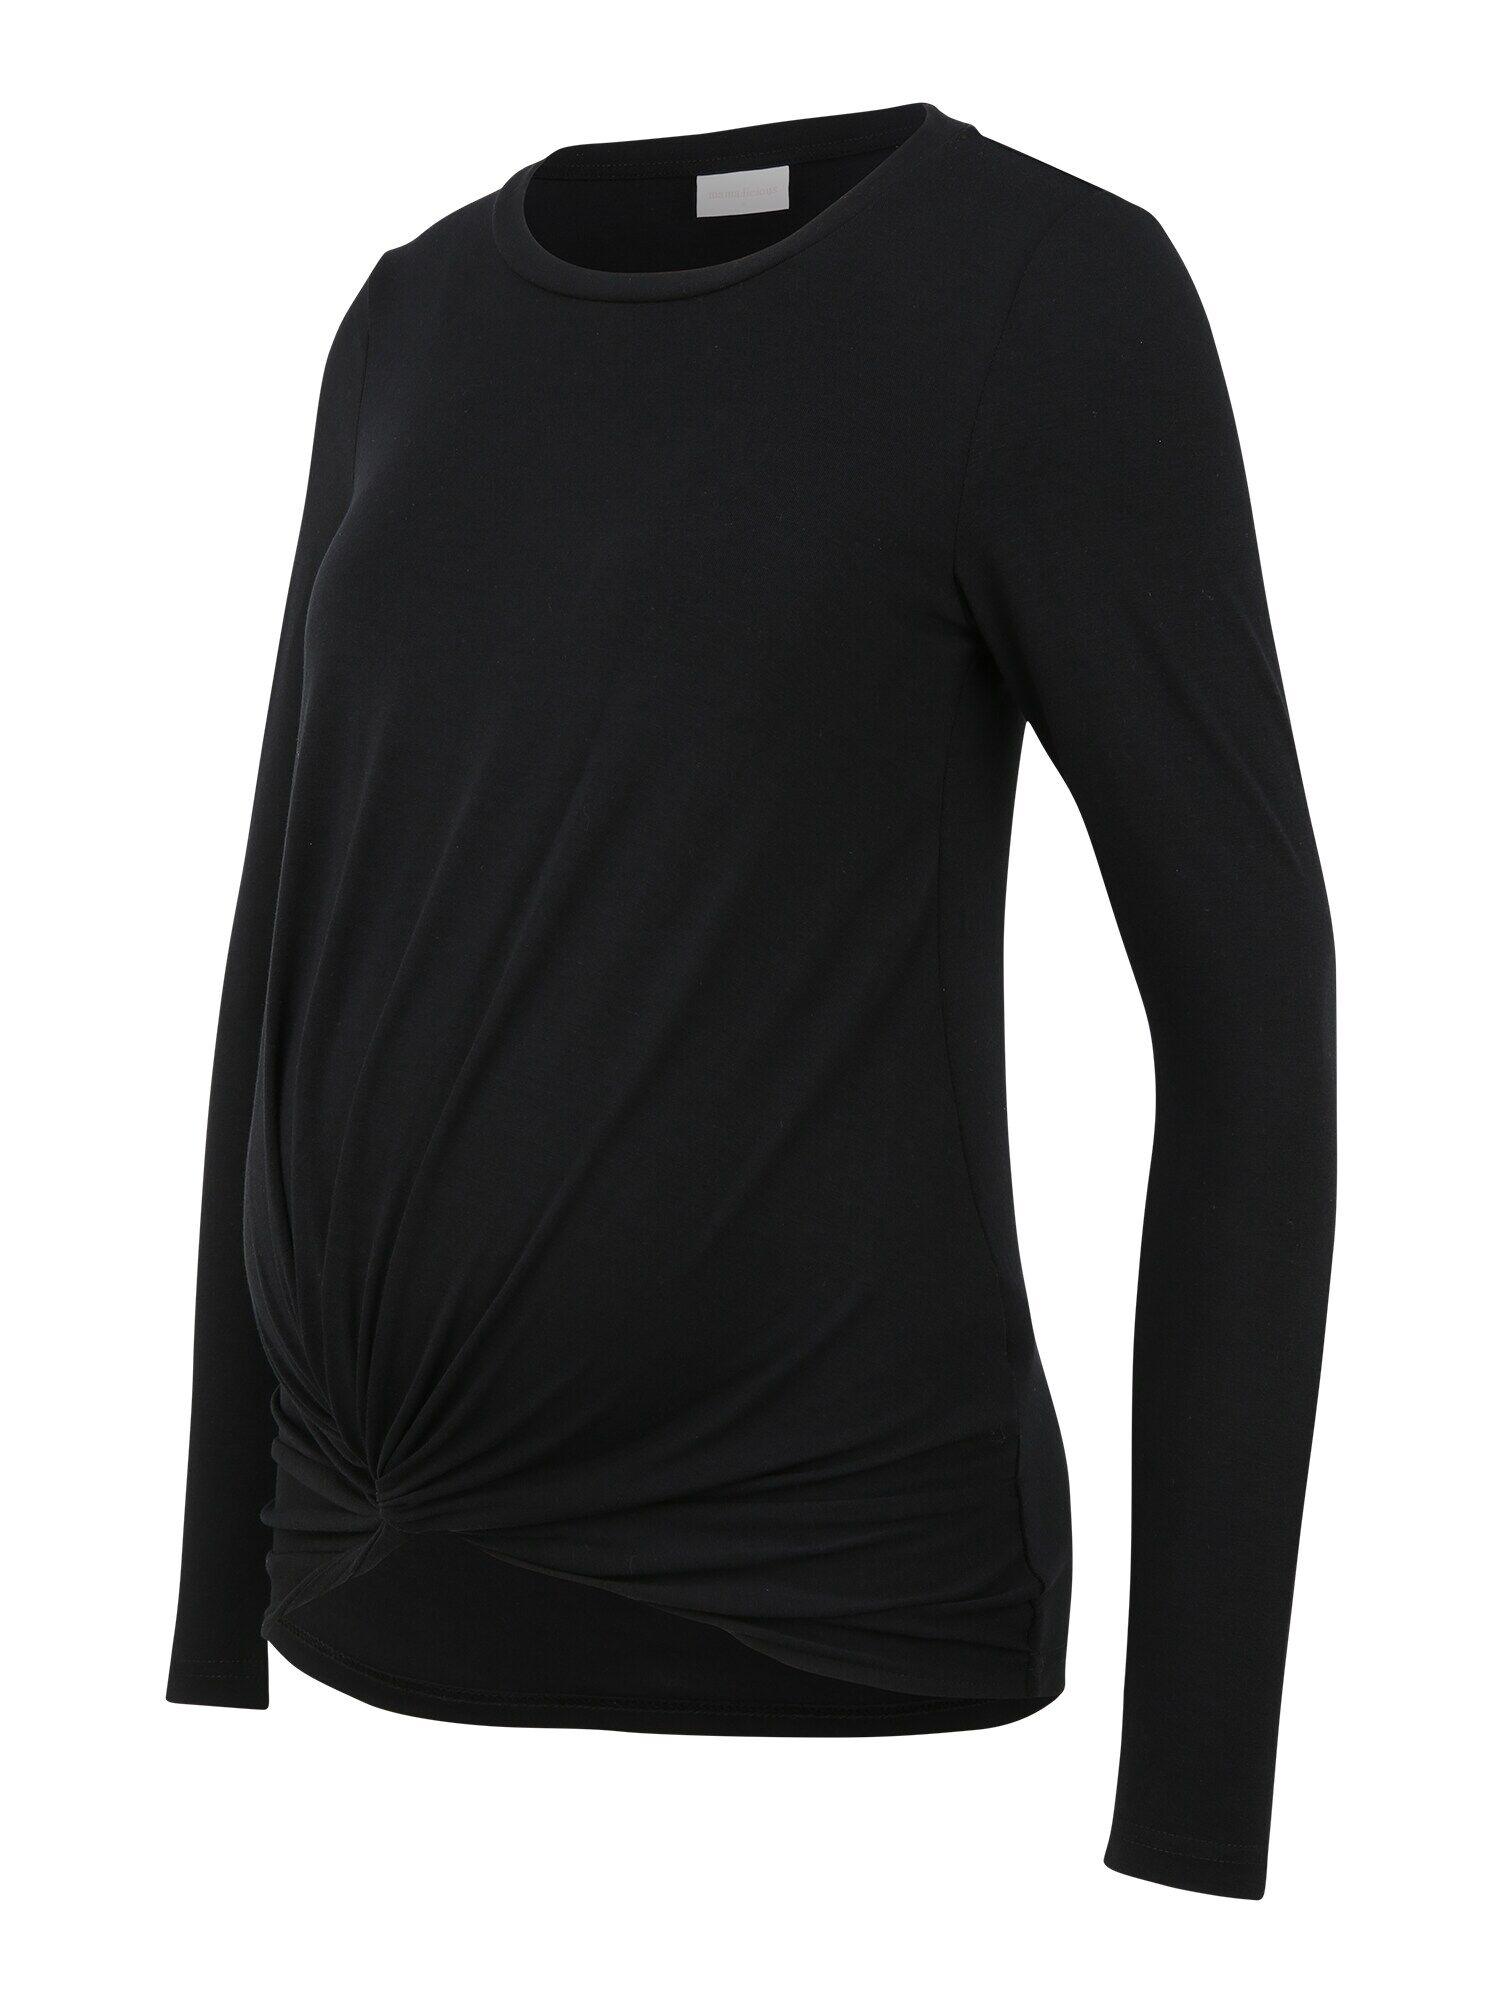 MAMALICIOUS T-shirt 'ELLI'  - Noir - Taille: XL - female